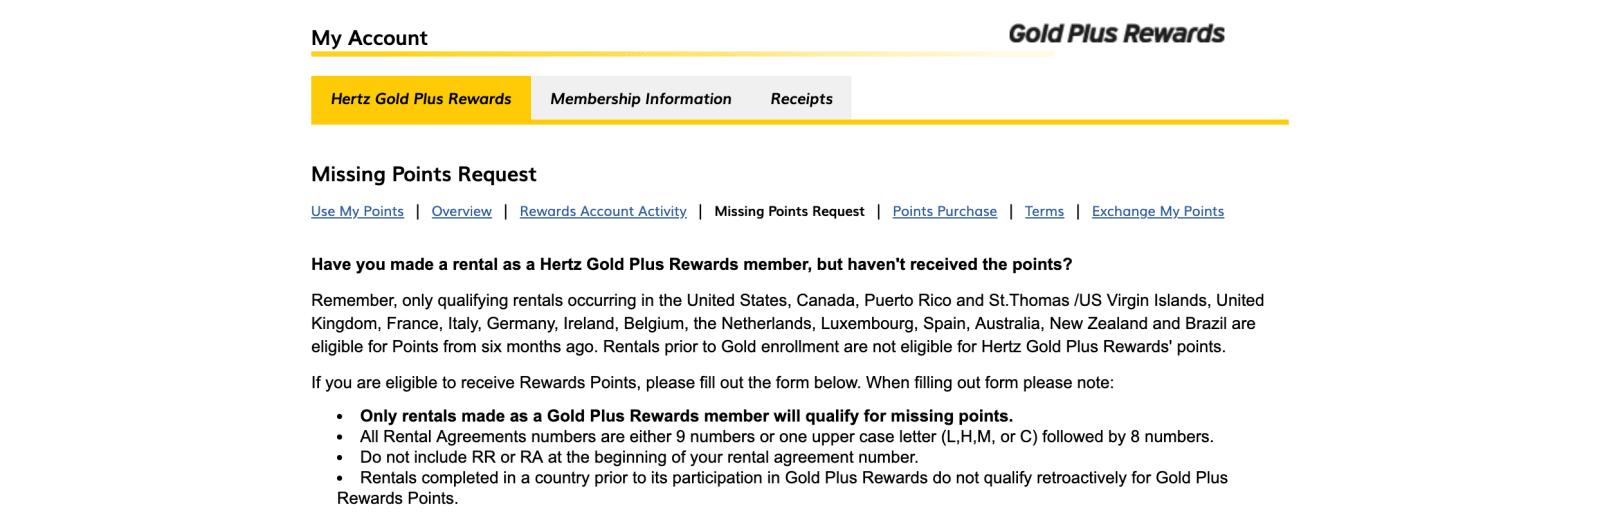 Hertz Gold Plus Rewards Program: Everything You Need to Know